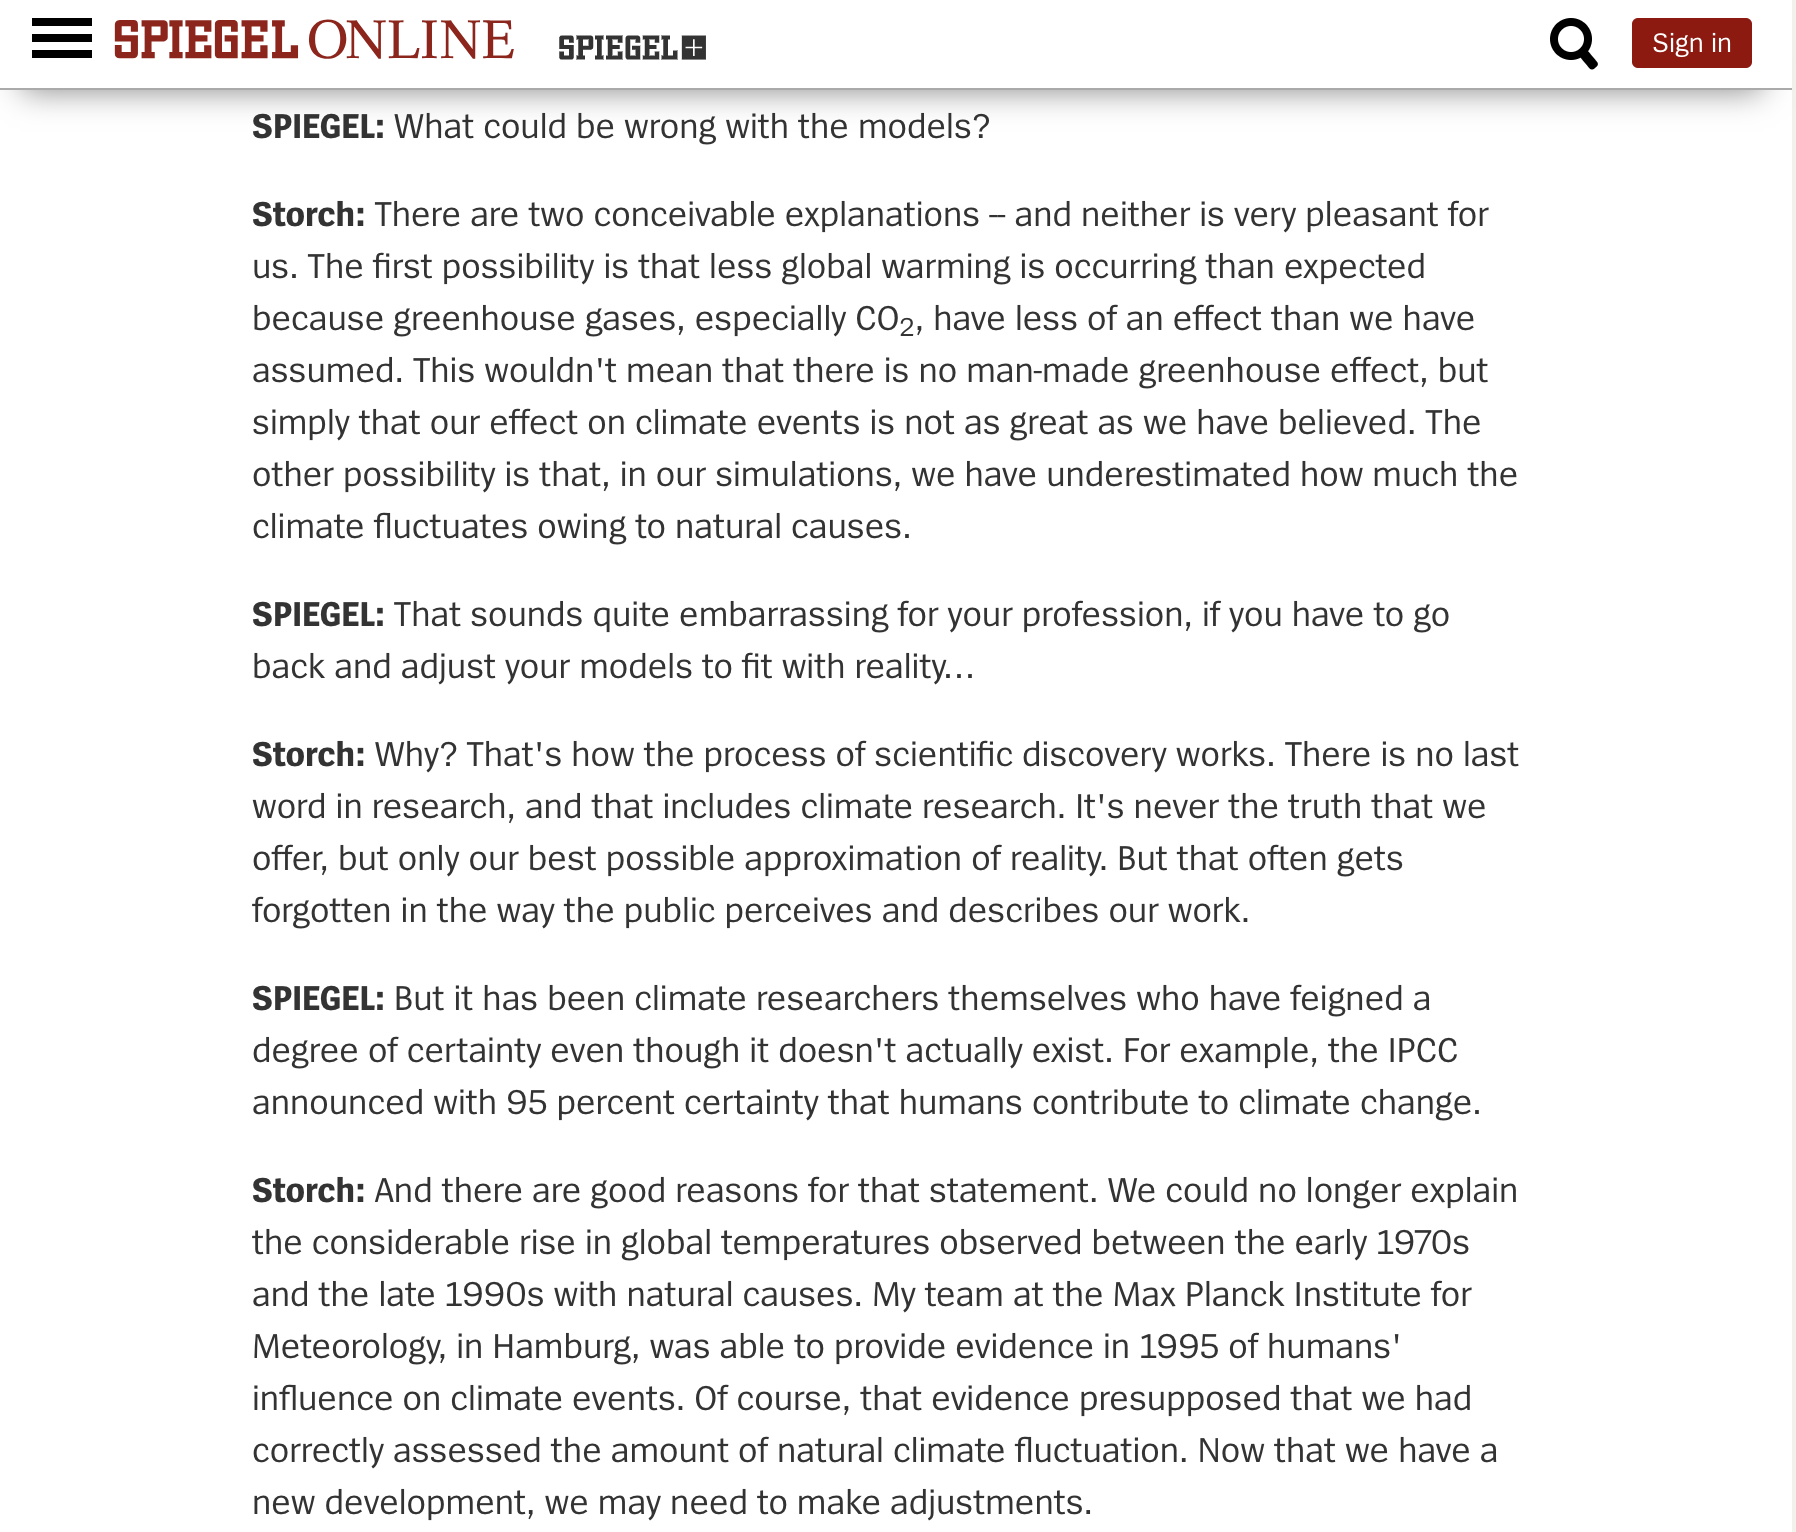 http://www.spiegel.de/international/world/interview-hans-von-storch-on-problems-with-climate-change-models-a-906721.html